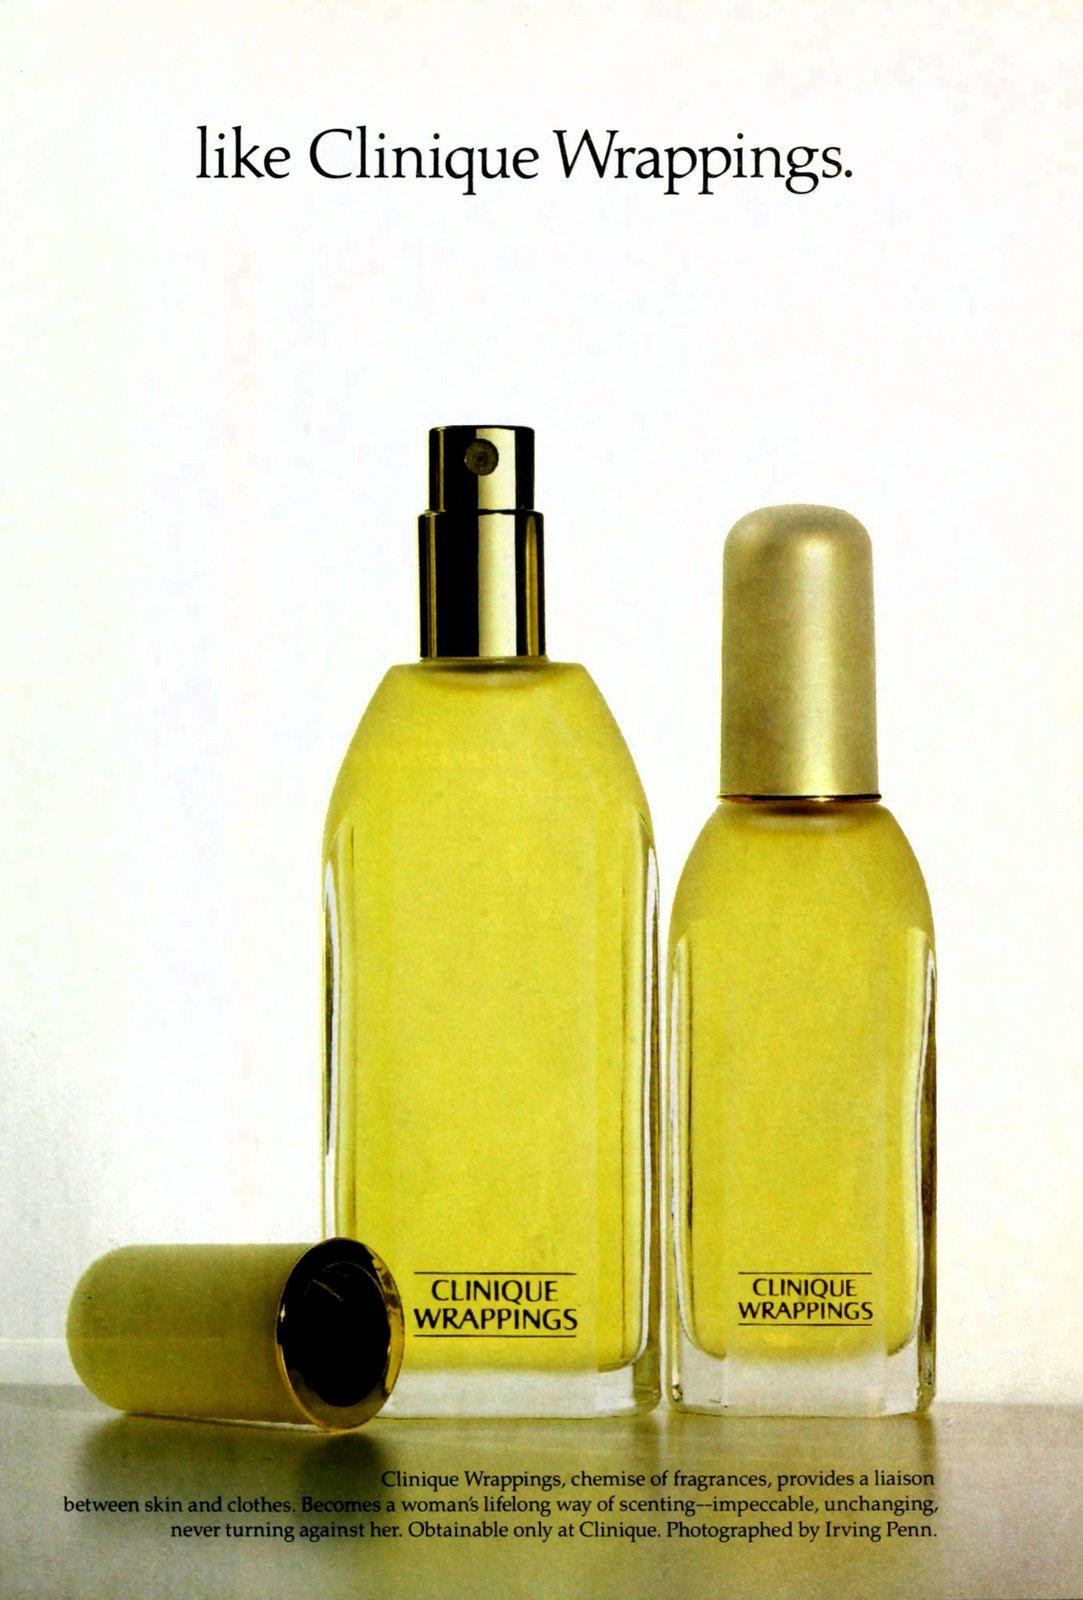 Clinique Wrappings fragrance (1991) at ClickAmericana.com